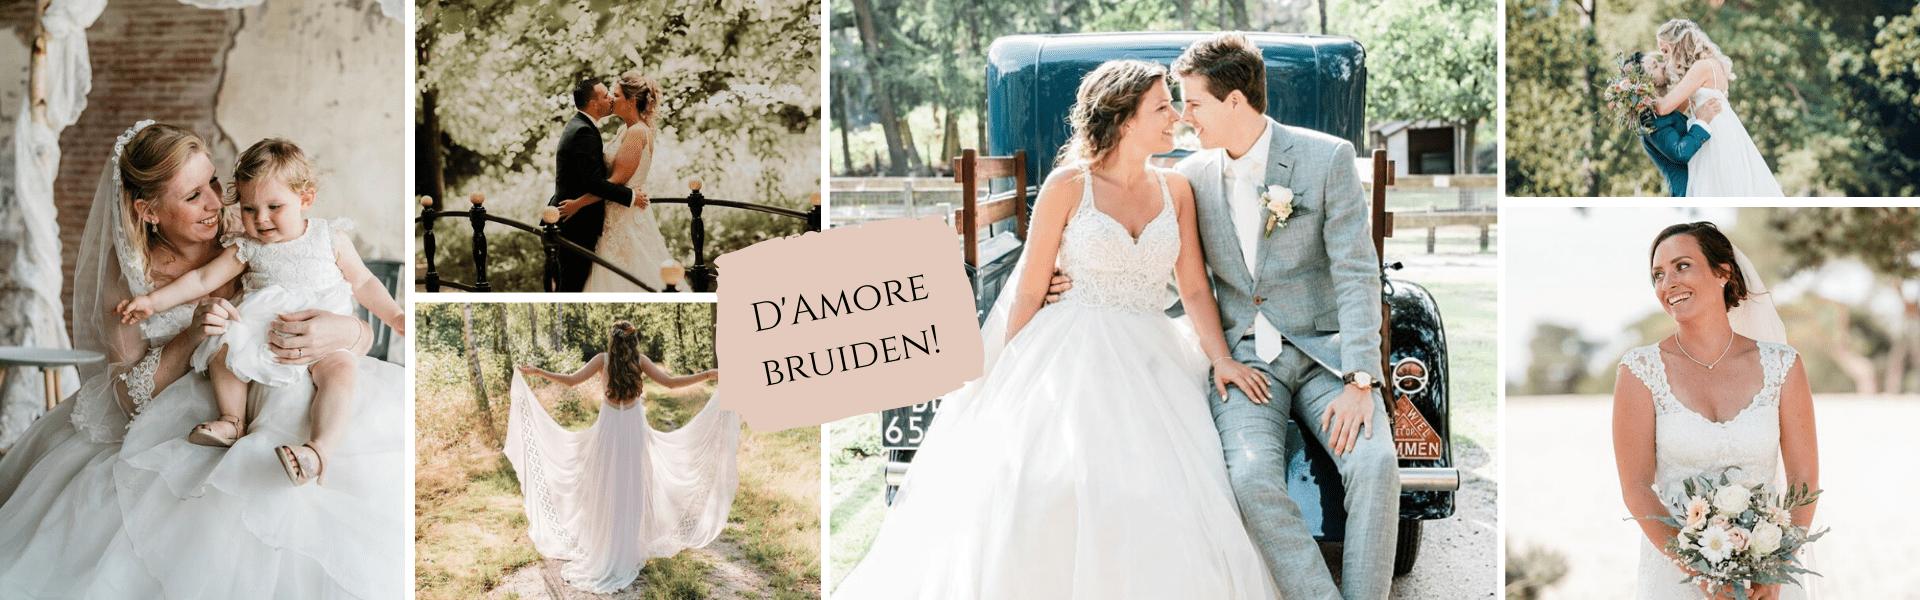 Website banner damore bruiden